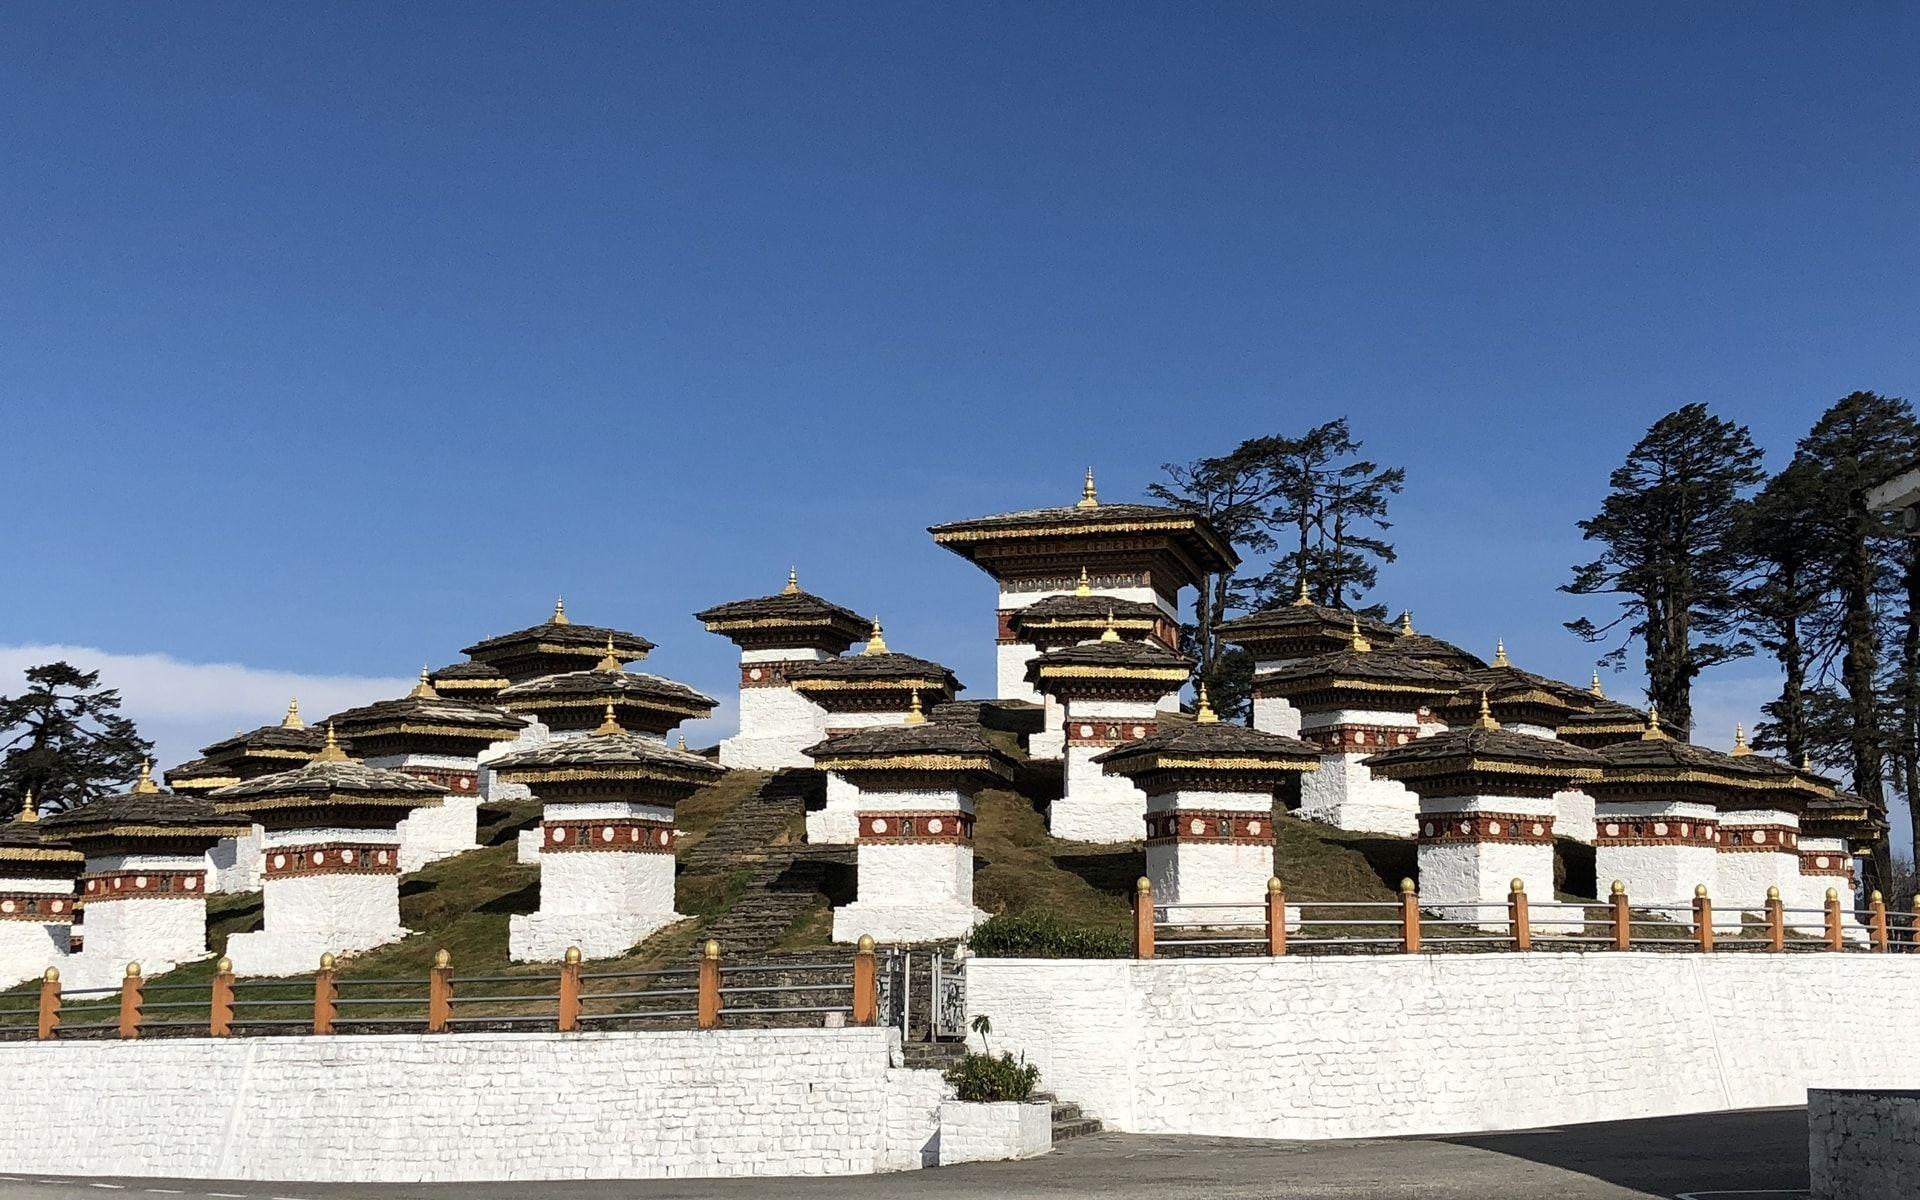 Druk Wangyal Chortens, 108 Stupa